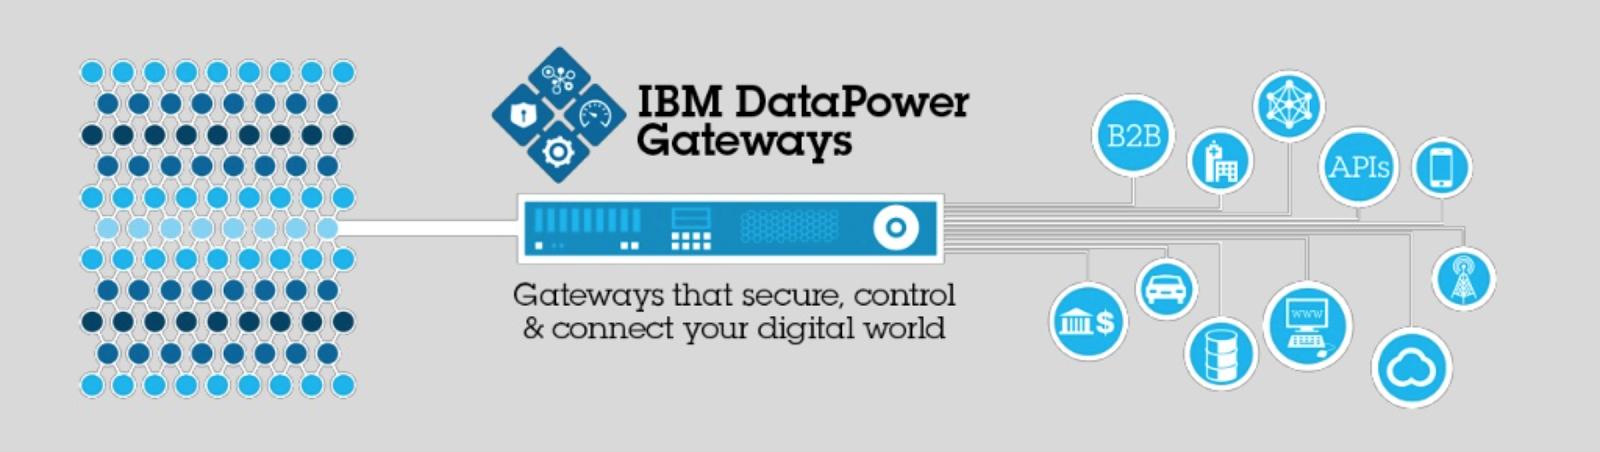 IBM Datapower Gateway & API Connect | TopDeploy Blog